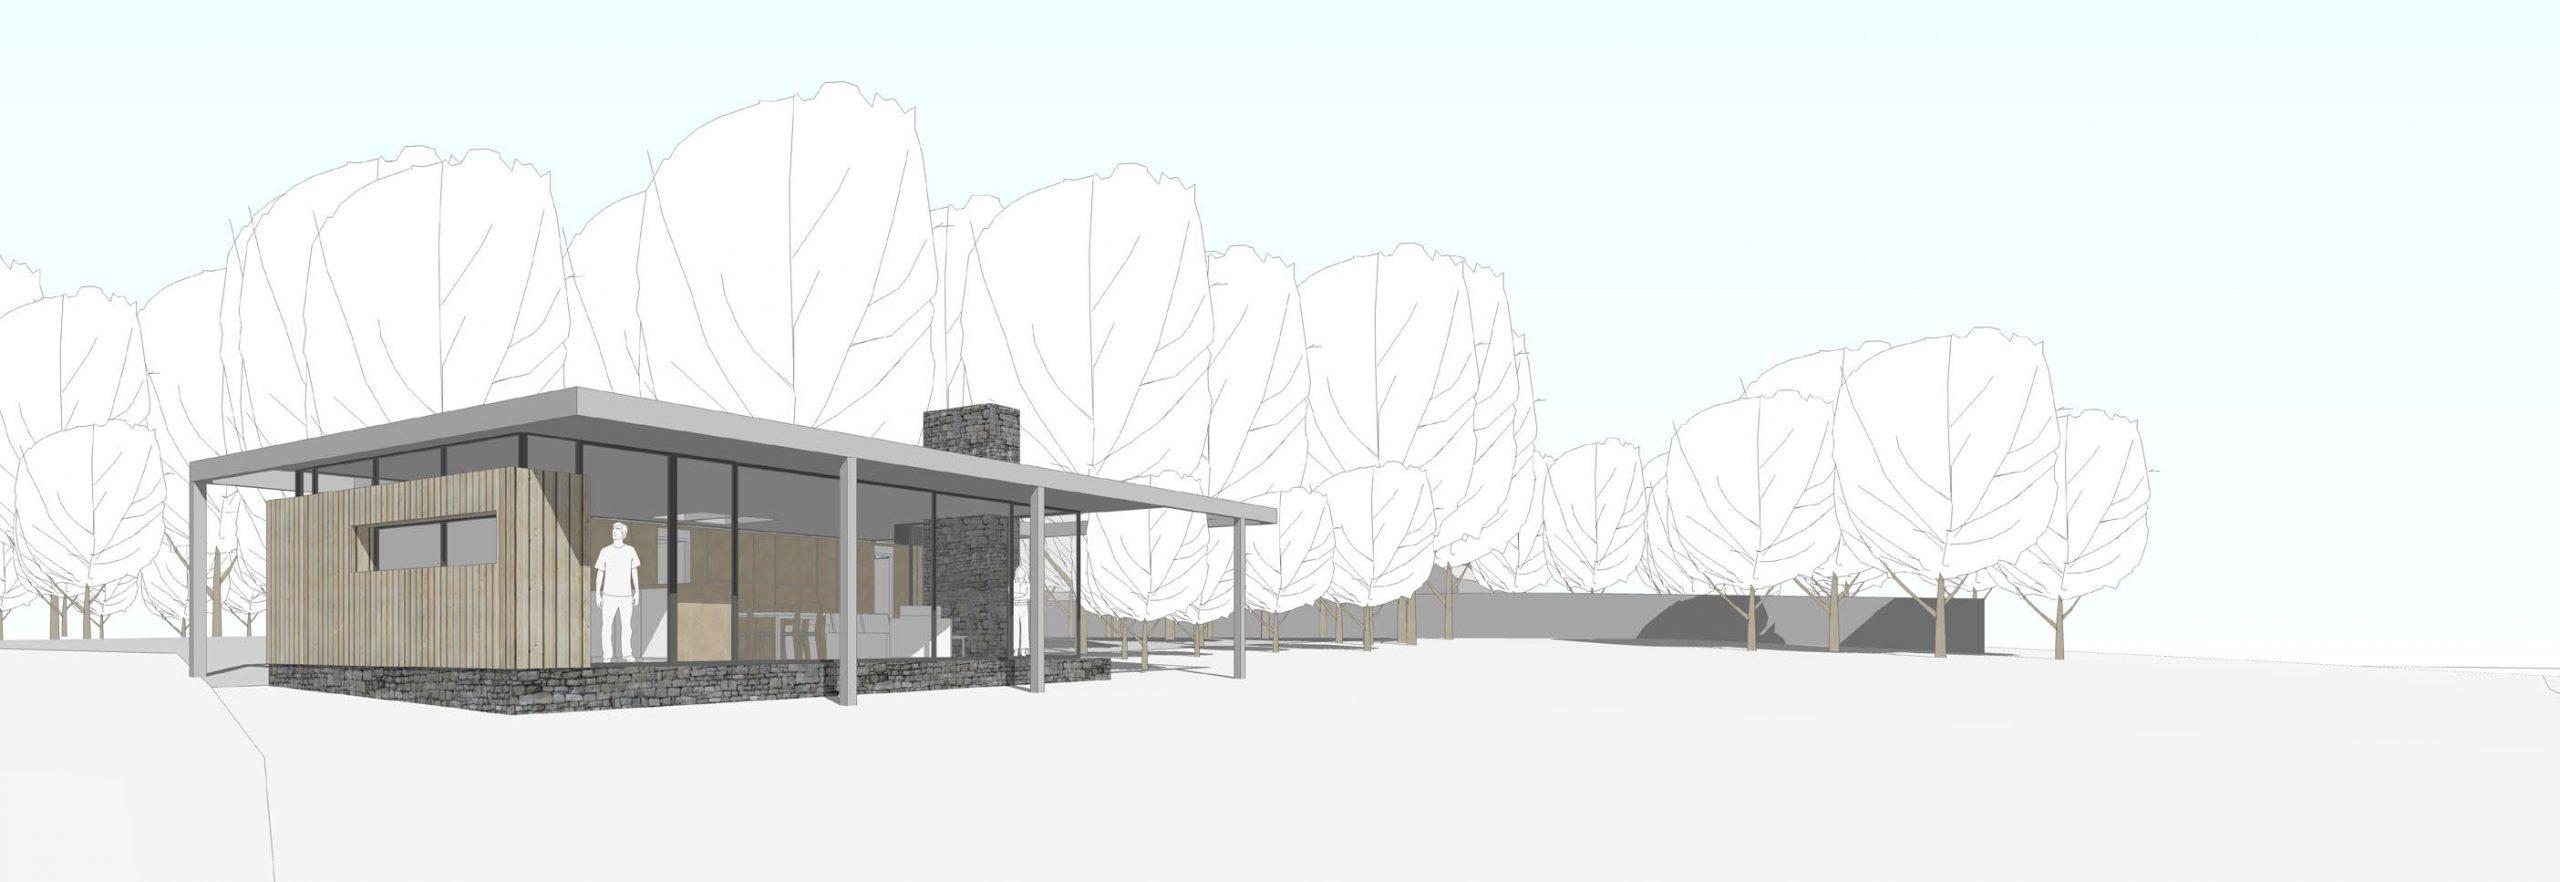 Northumberland-lodge-external-render